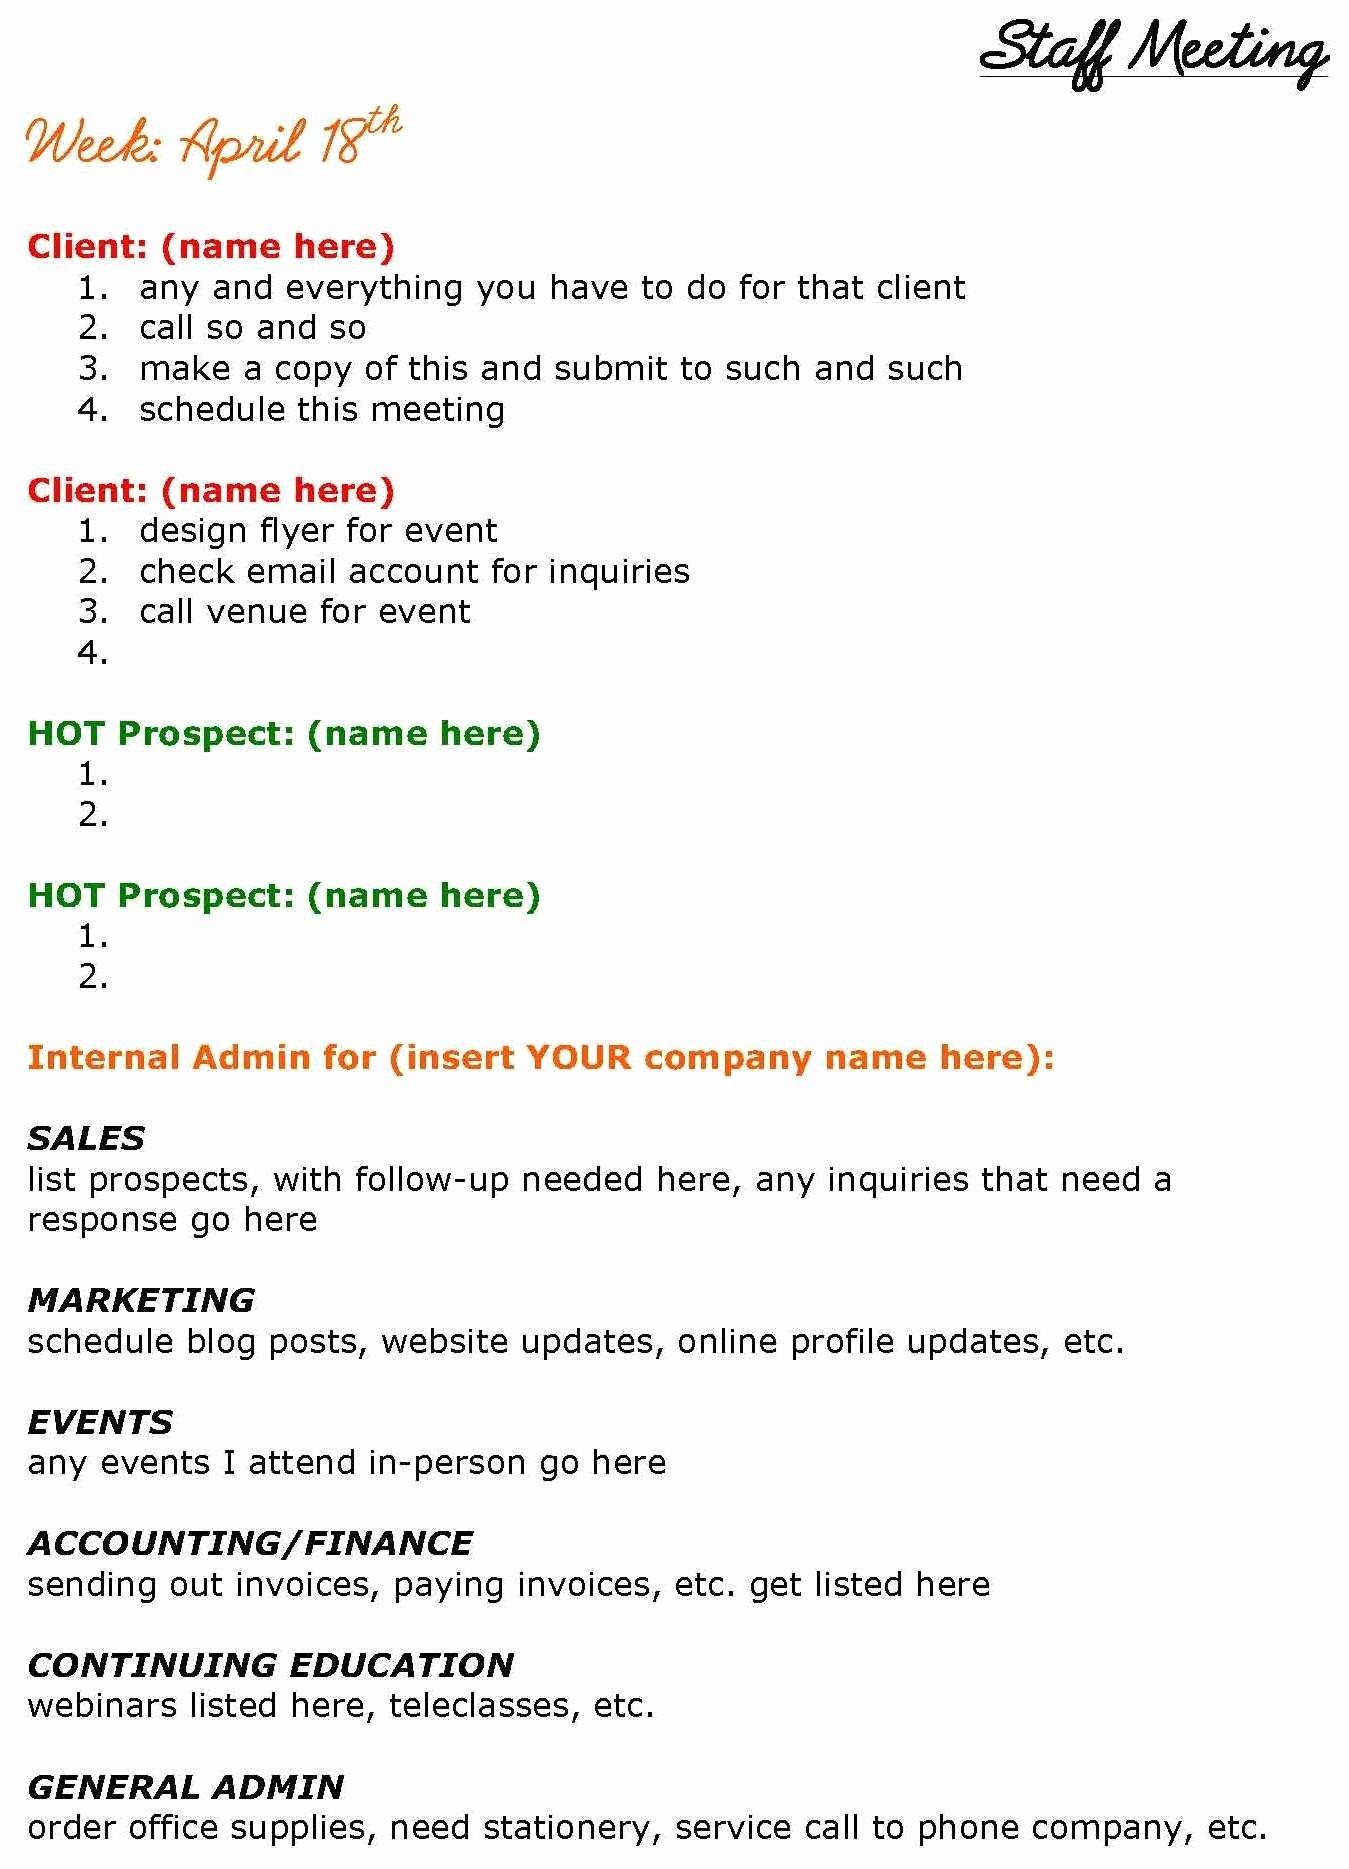 Staff Meetings Agenda Template New solopreneurs Need Staff Meetings too See This Staff